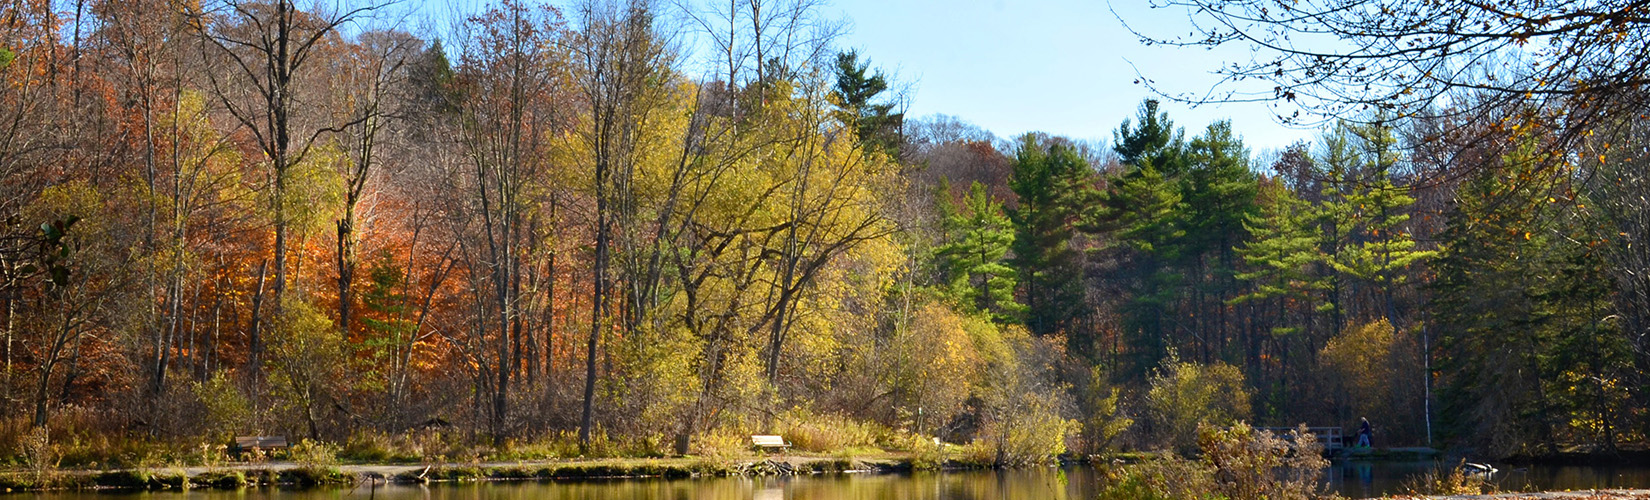 St Johns Conservation Area: A Quaint Natural Spot in Font Hill :: I've Been Bit! Travel Blog